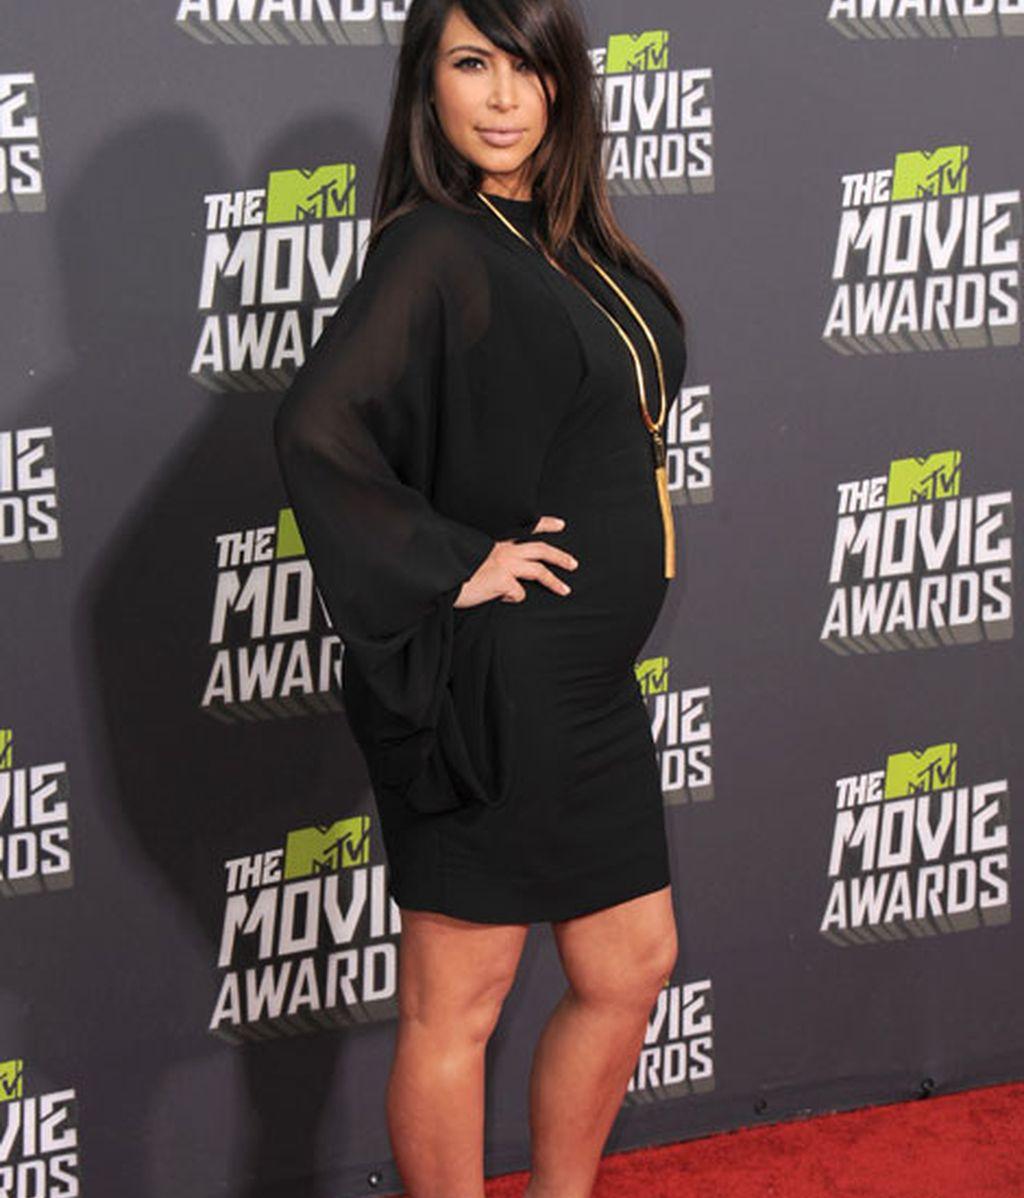 Kim Kardashian lució embarazo con un discreto vestido negro